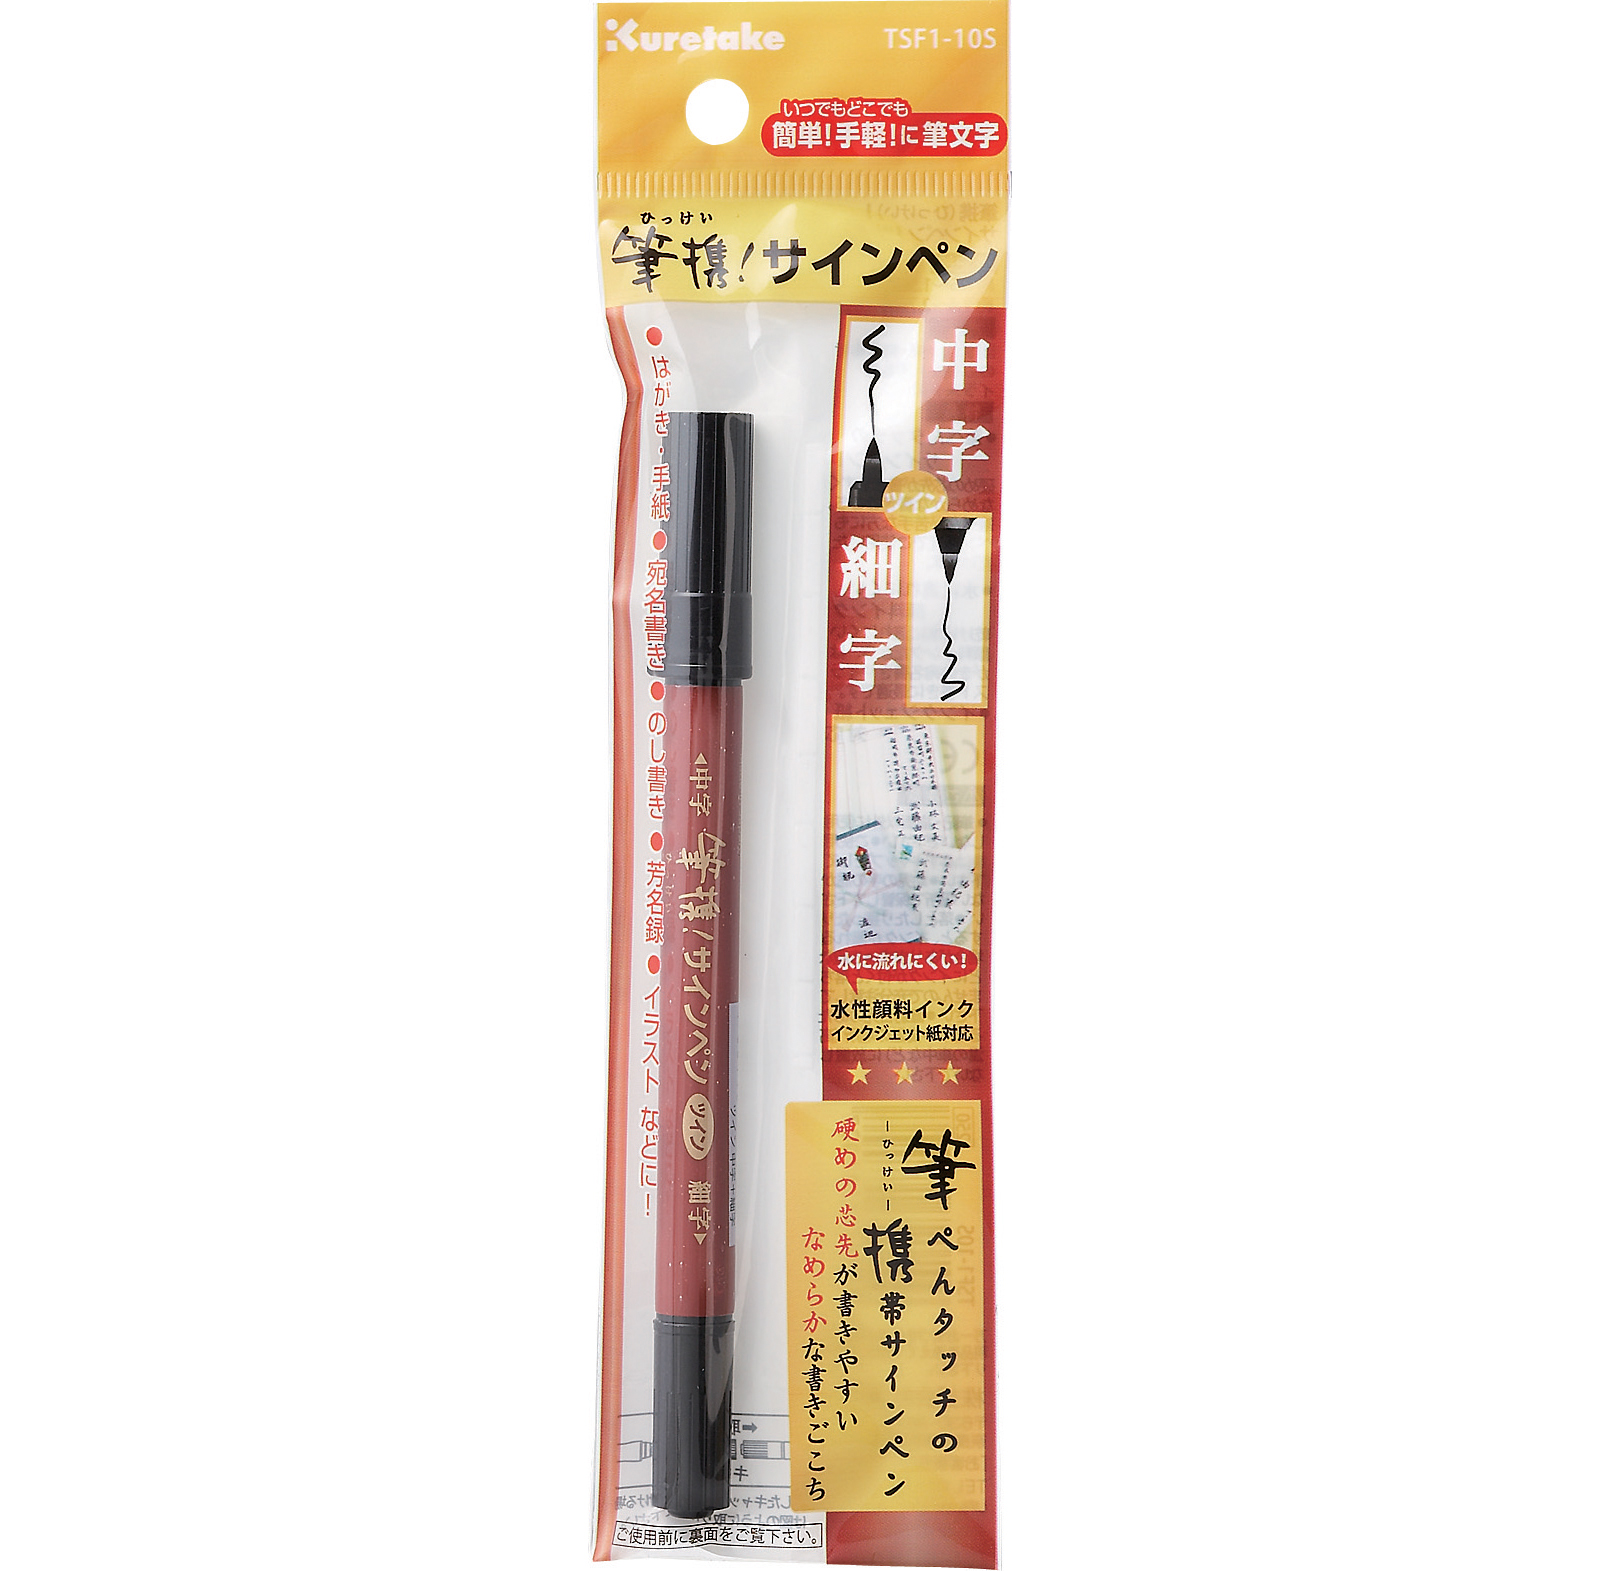 Kuretake Bimoji Fude Brush Pens, Large Felt Tip